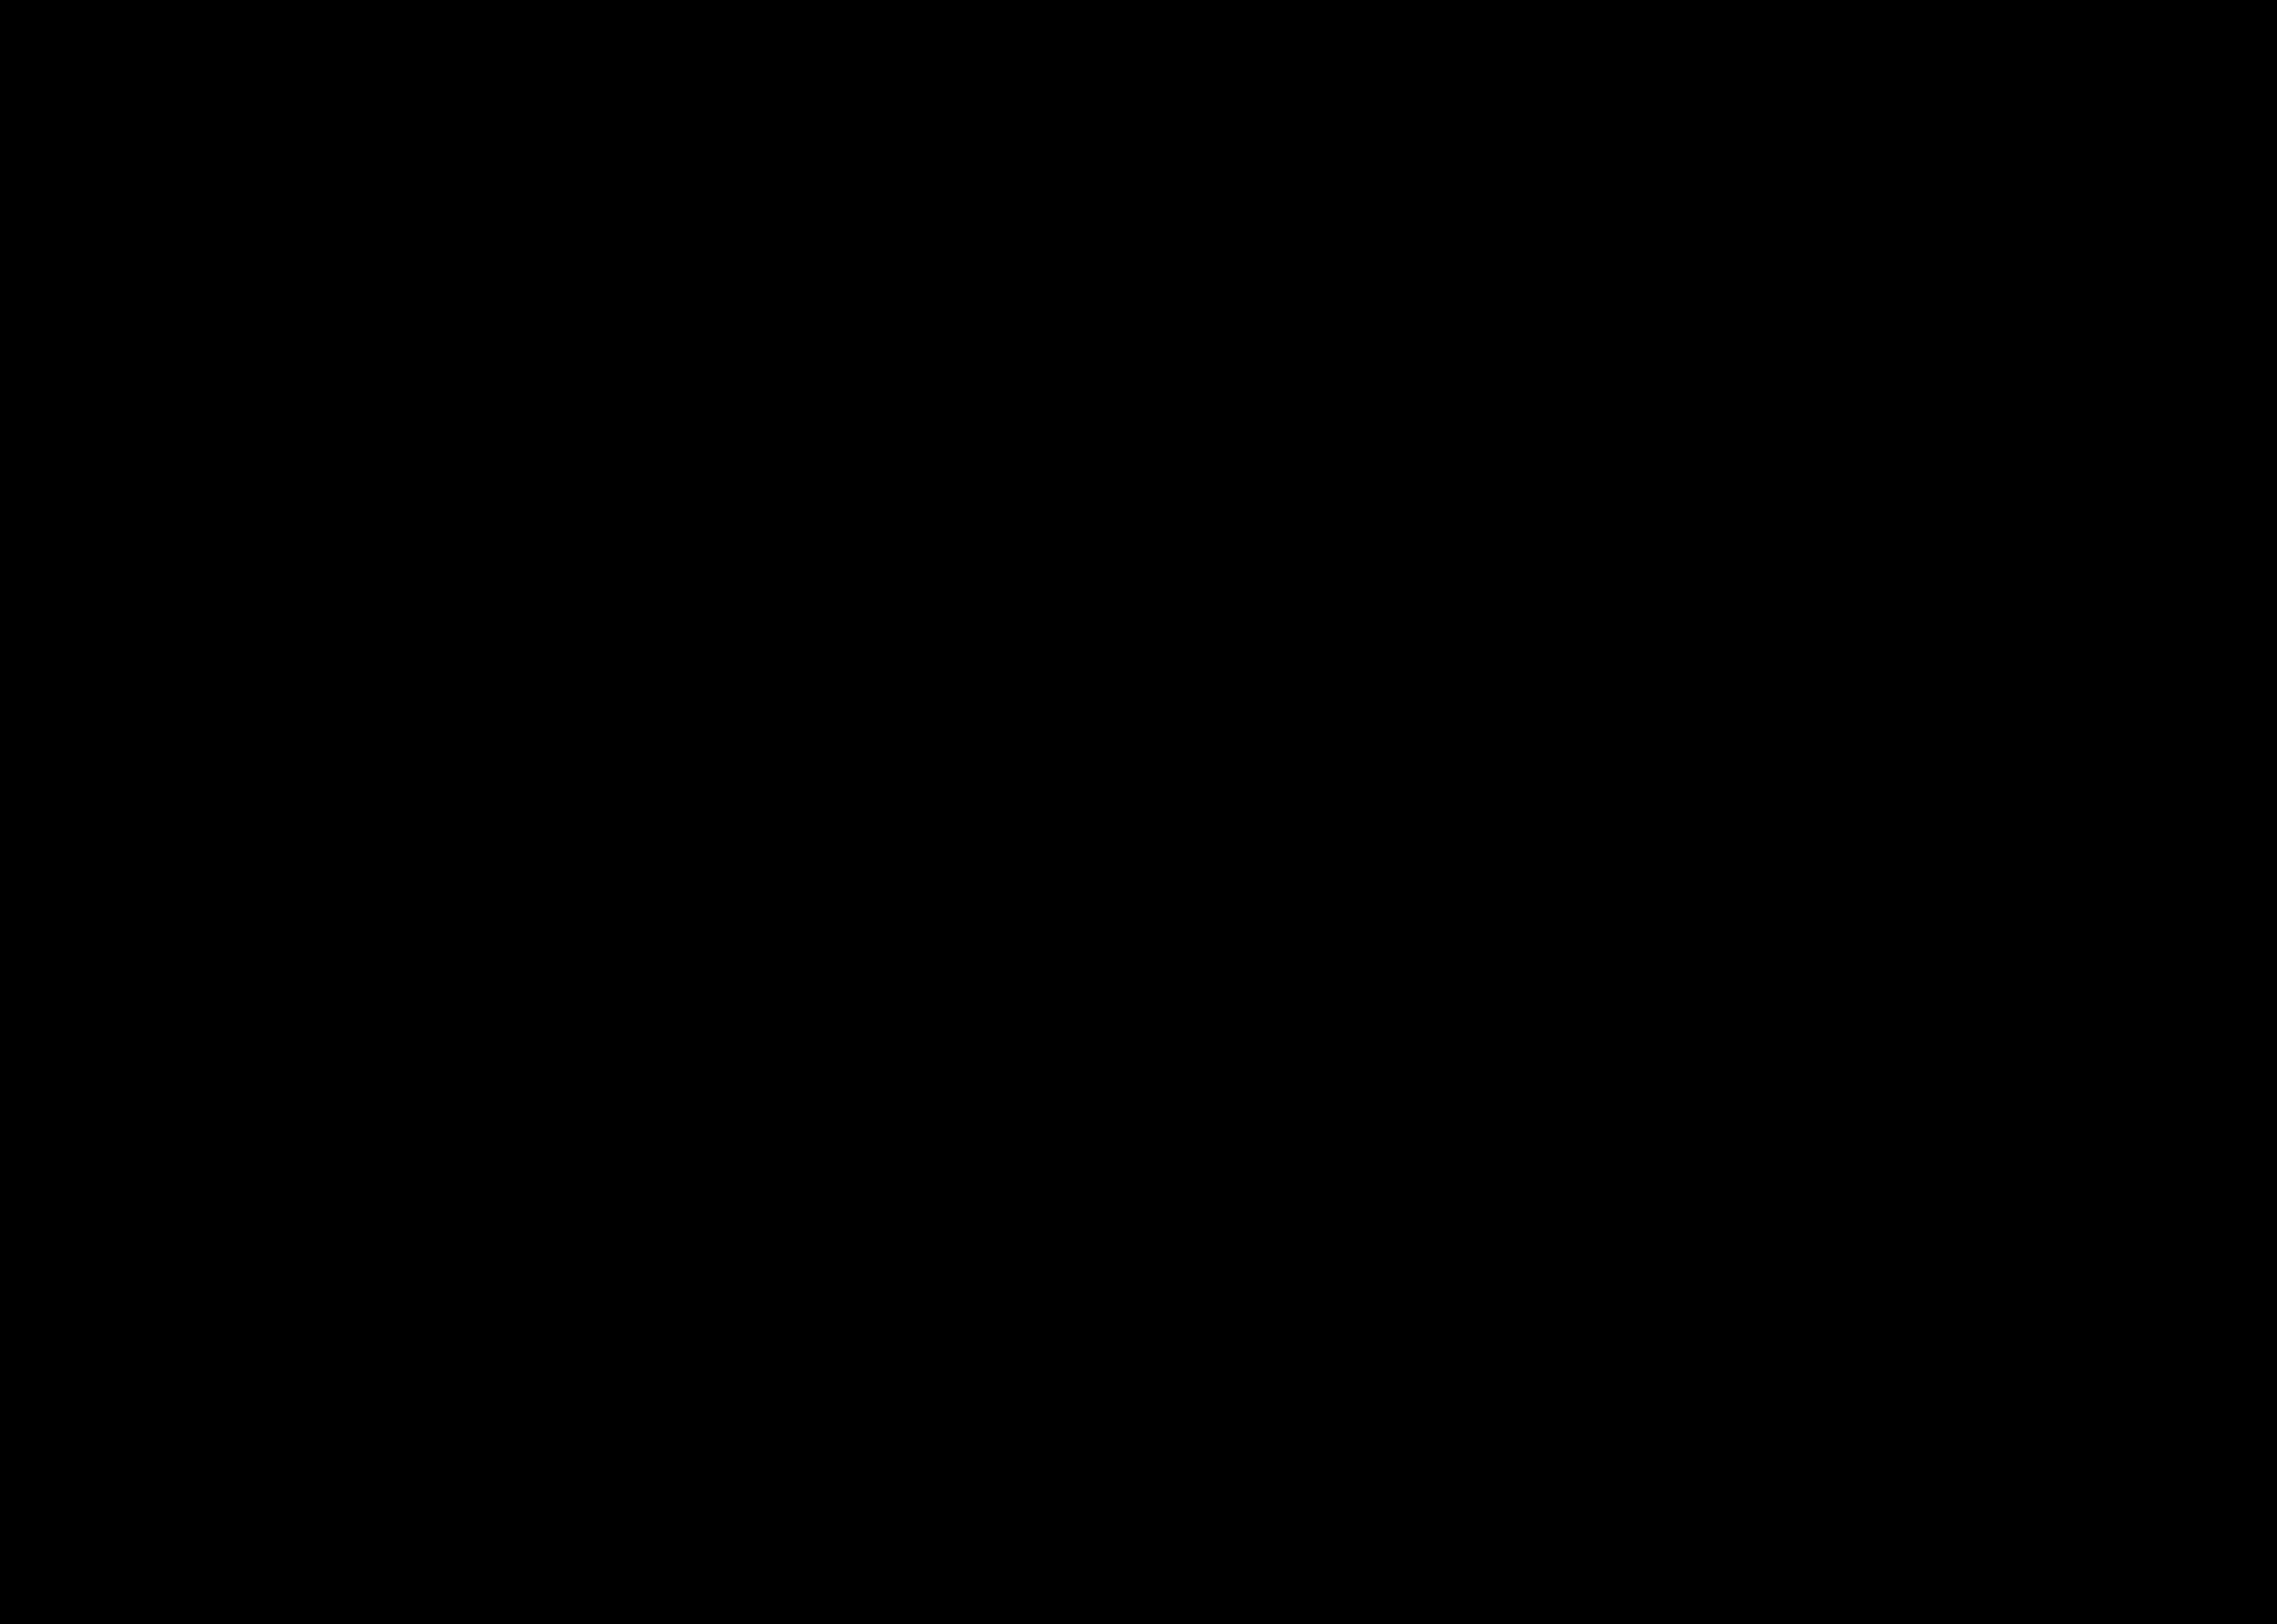 Assault Rifle clipart uzi Uzi silhouette silhouette Uzi Clipart